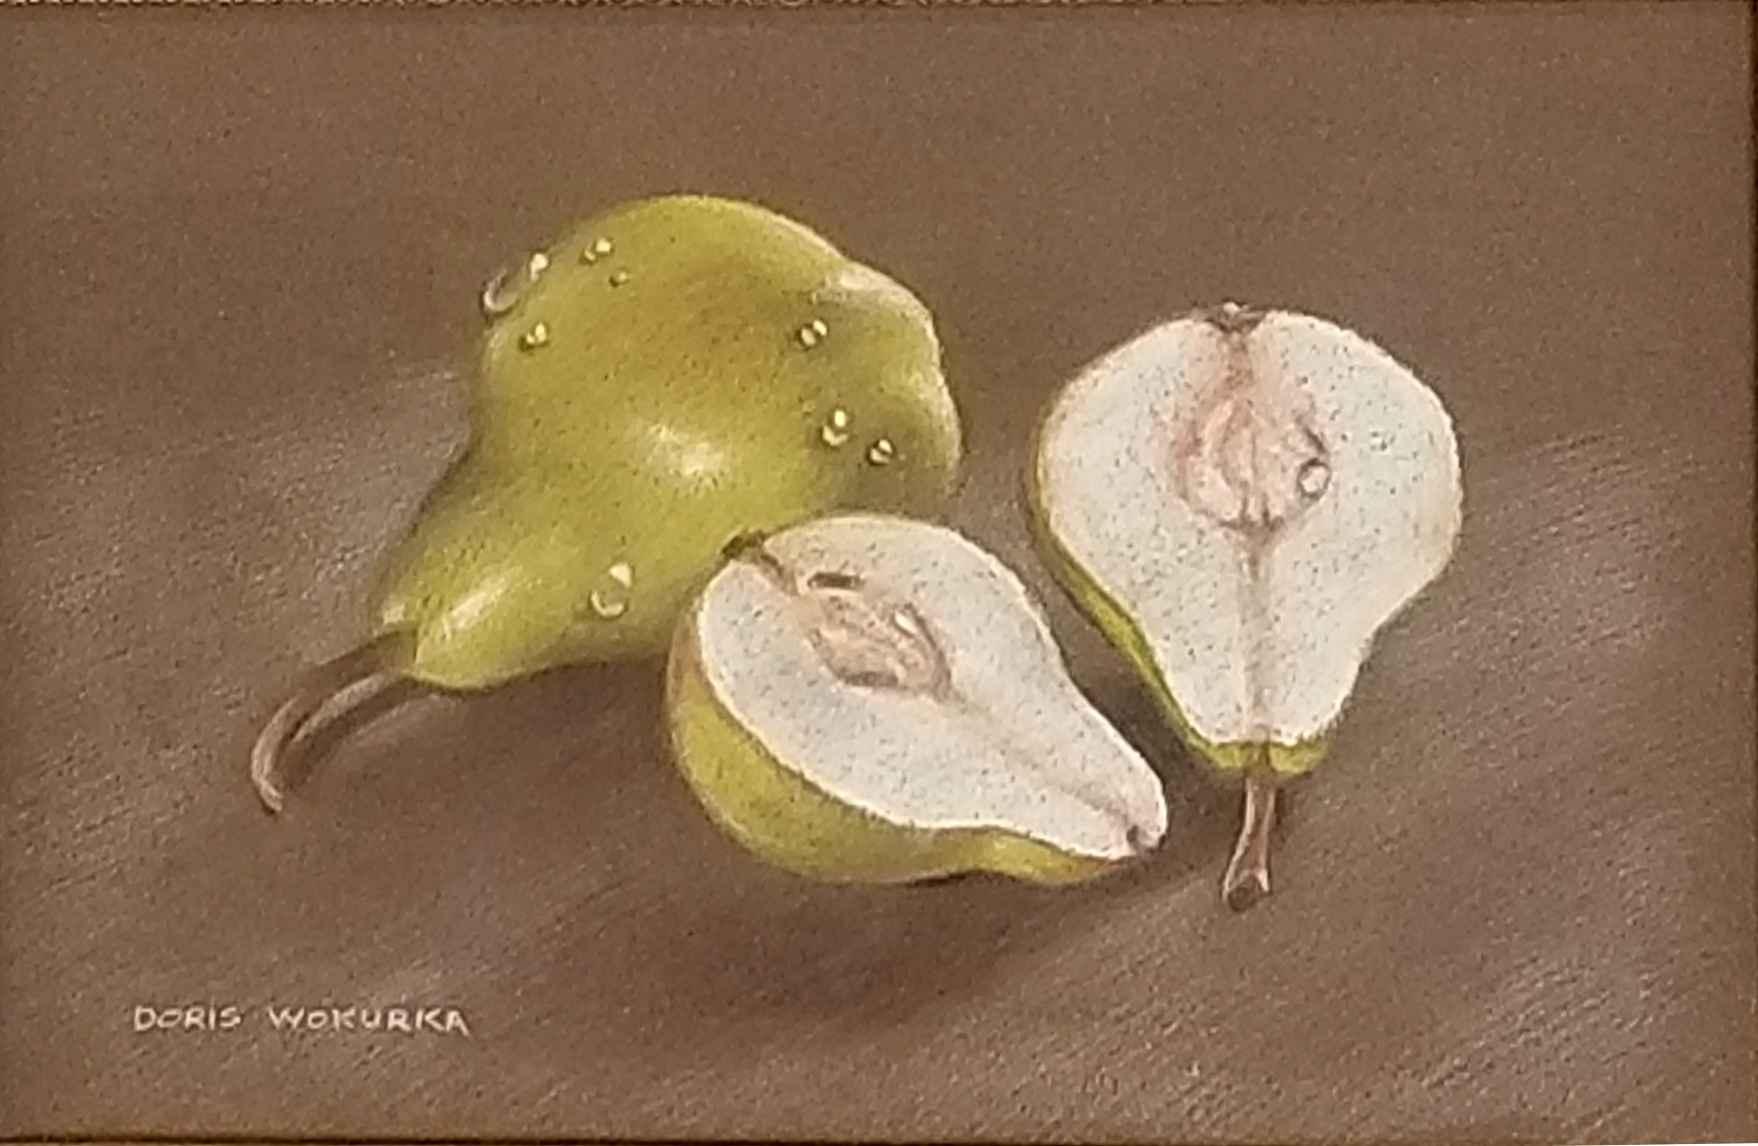 Untitled (Pears) by Ms. Doris Wokurka - Masterpiece Online